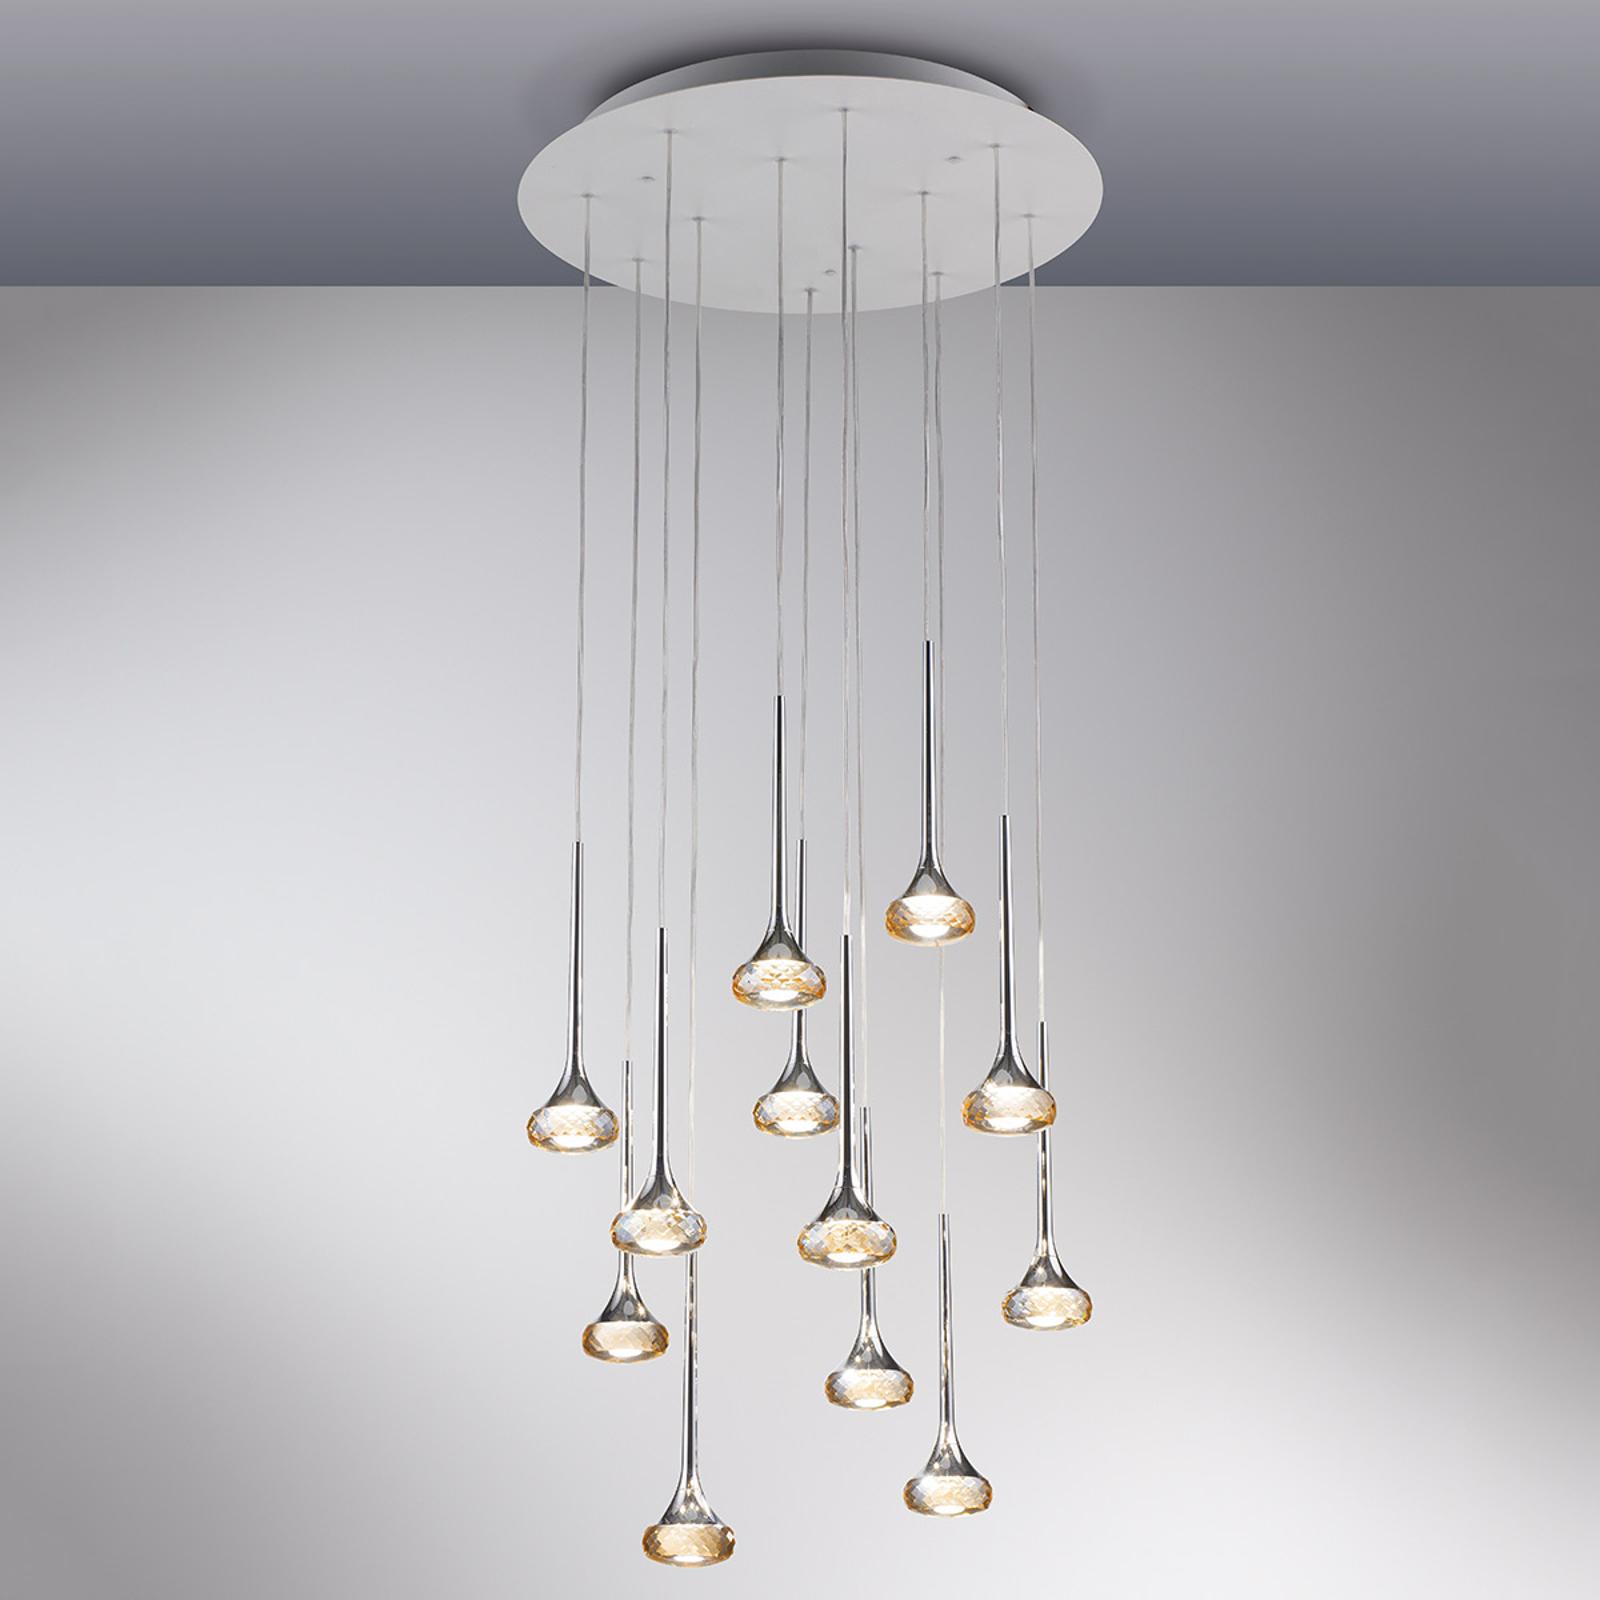 Axolight Fairy 12-pl LED závesné svietidlo, jantár_1088058_1